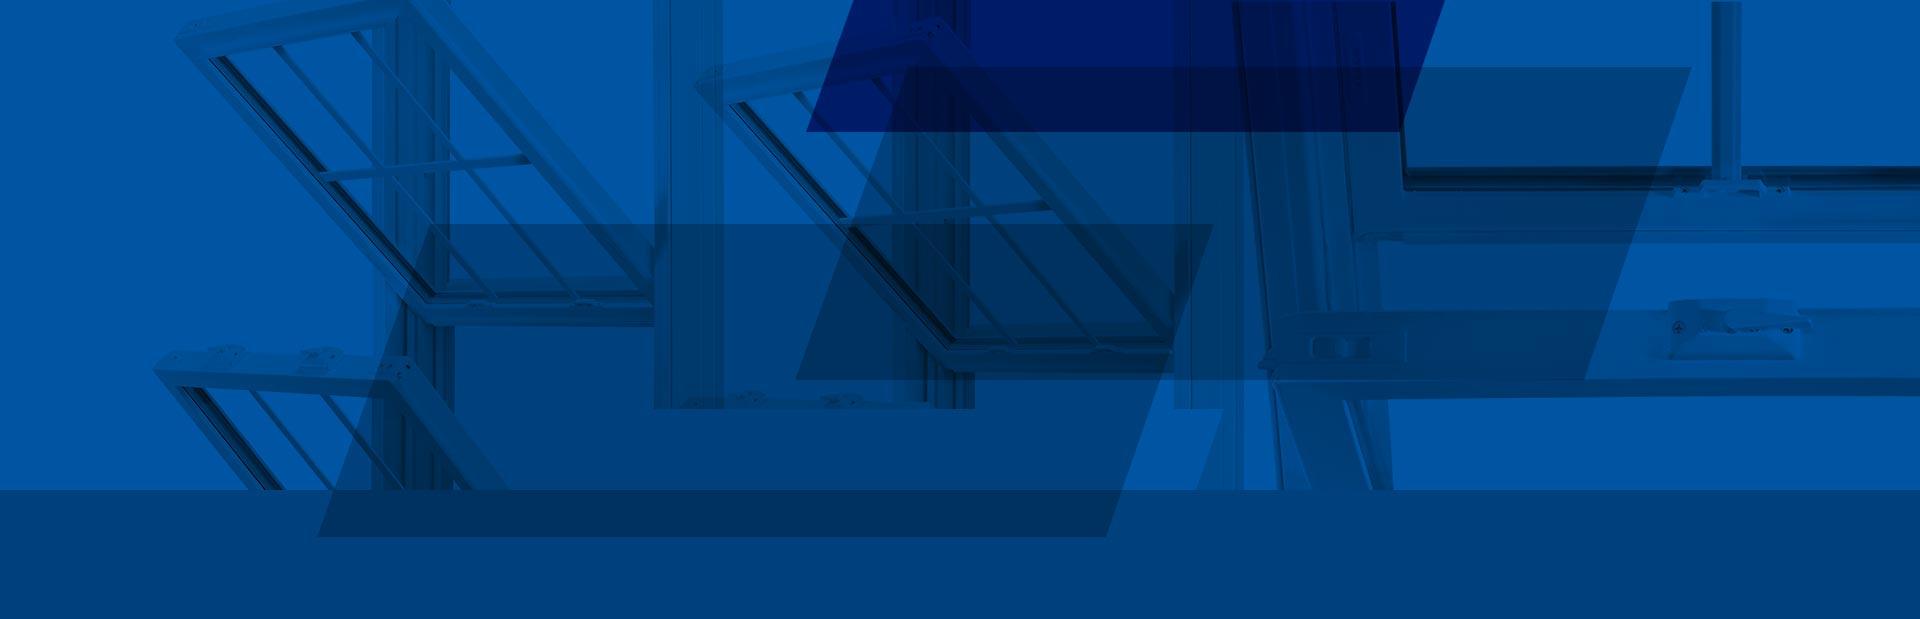 Vinyl top installation in denver for Vinyl windows denver